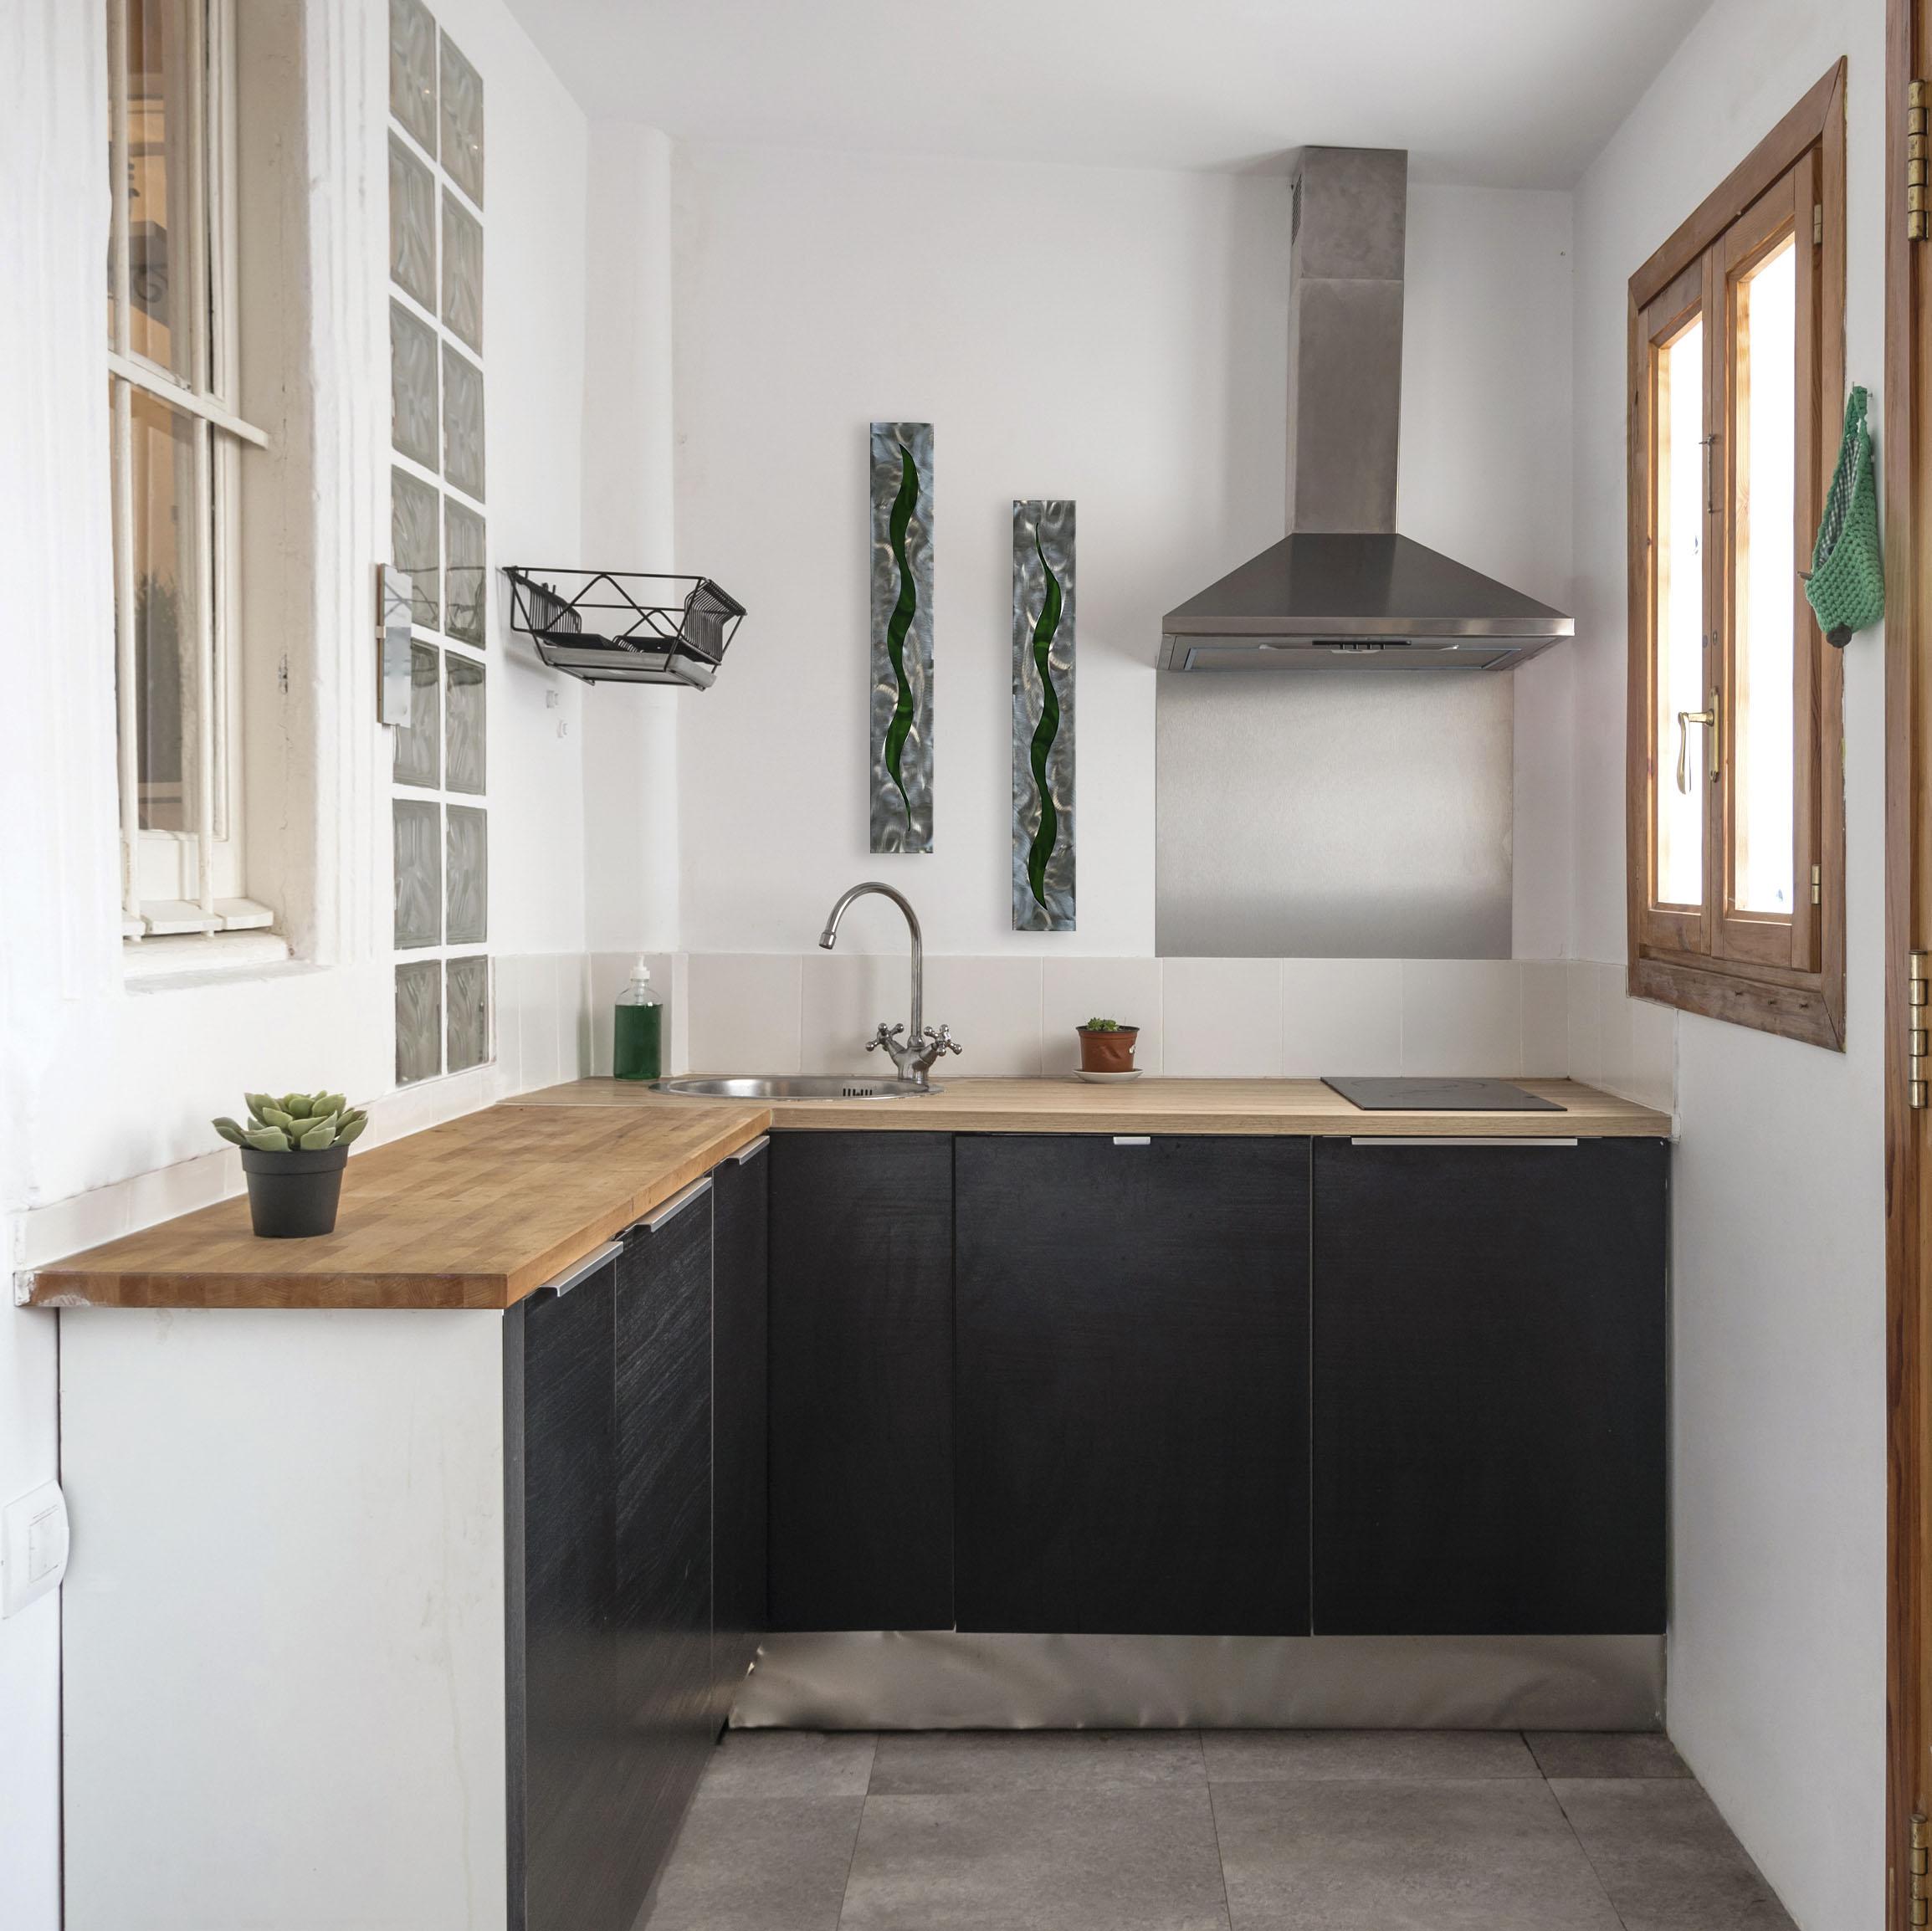 green-scars-in-kitchen